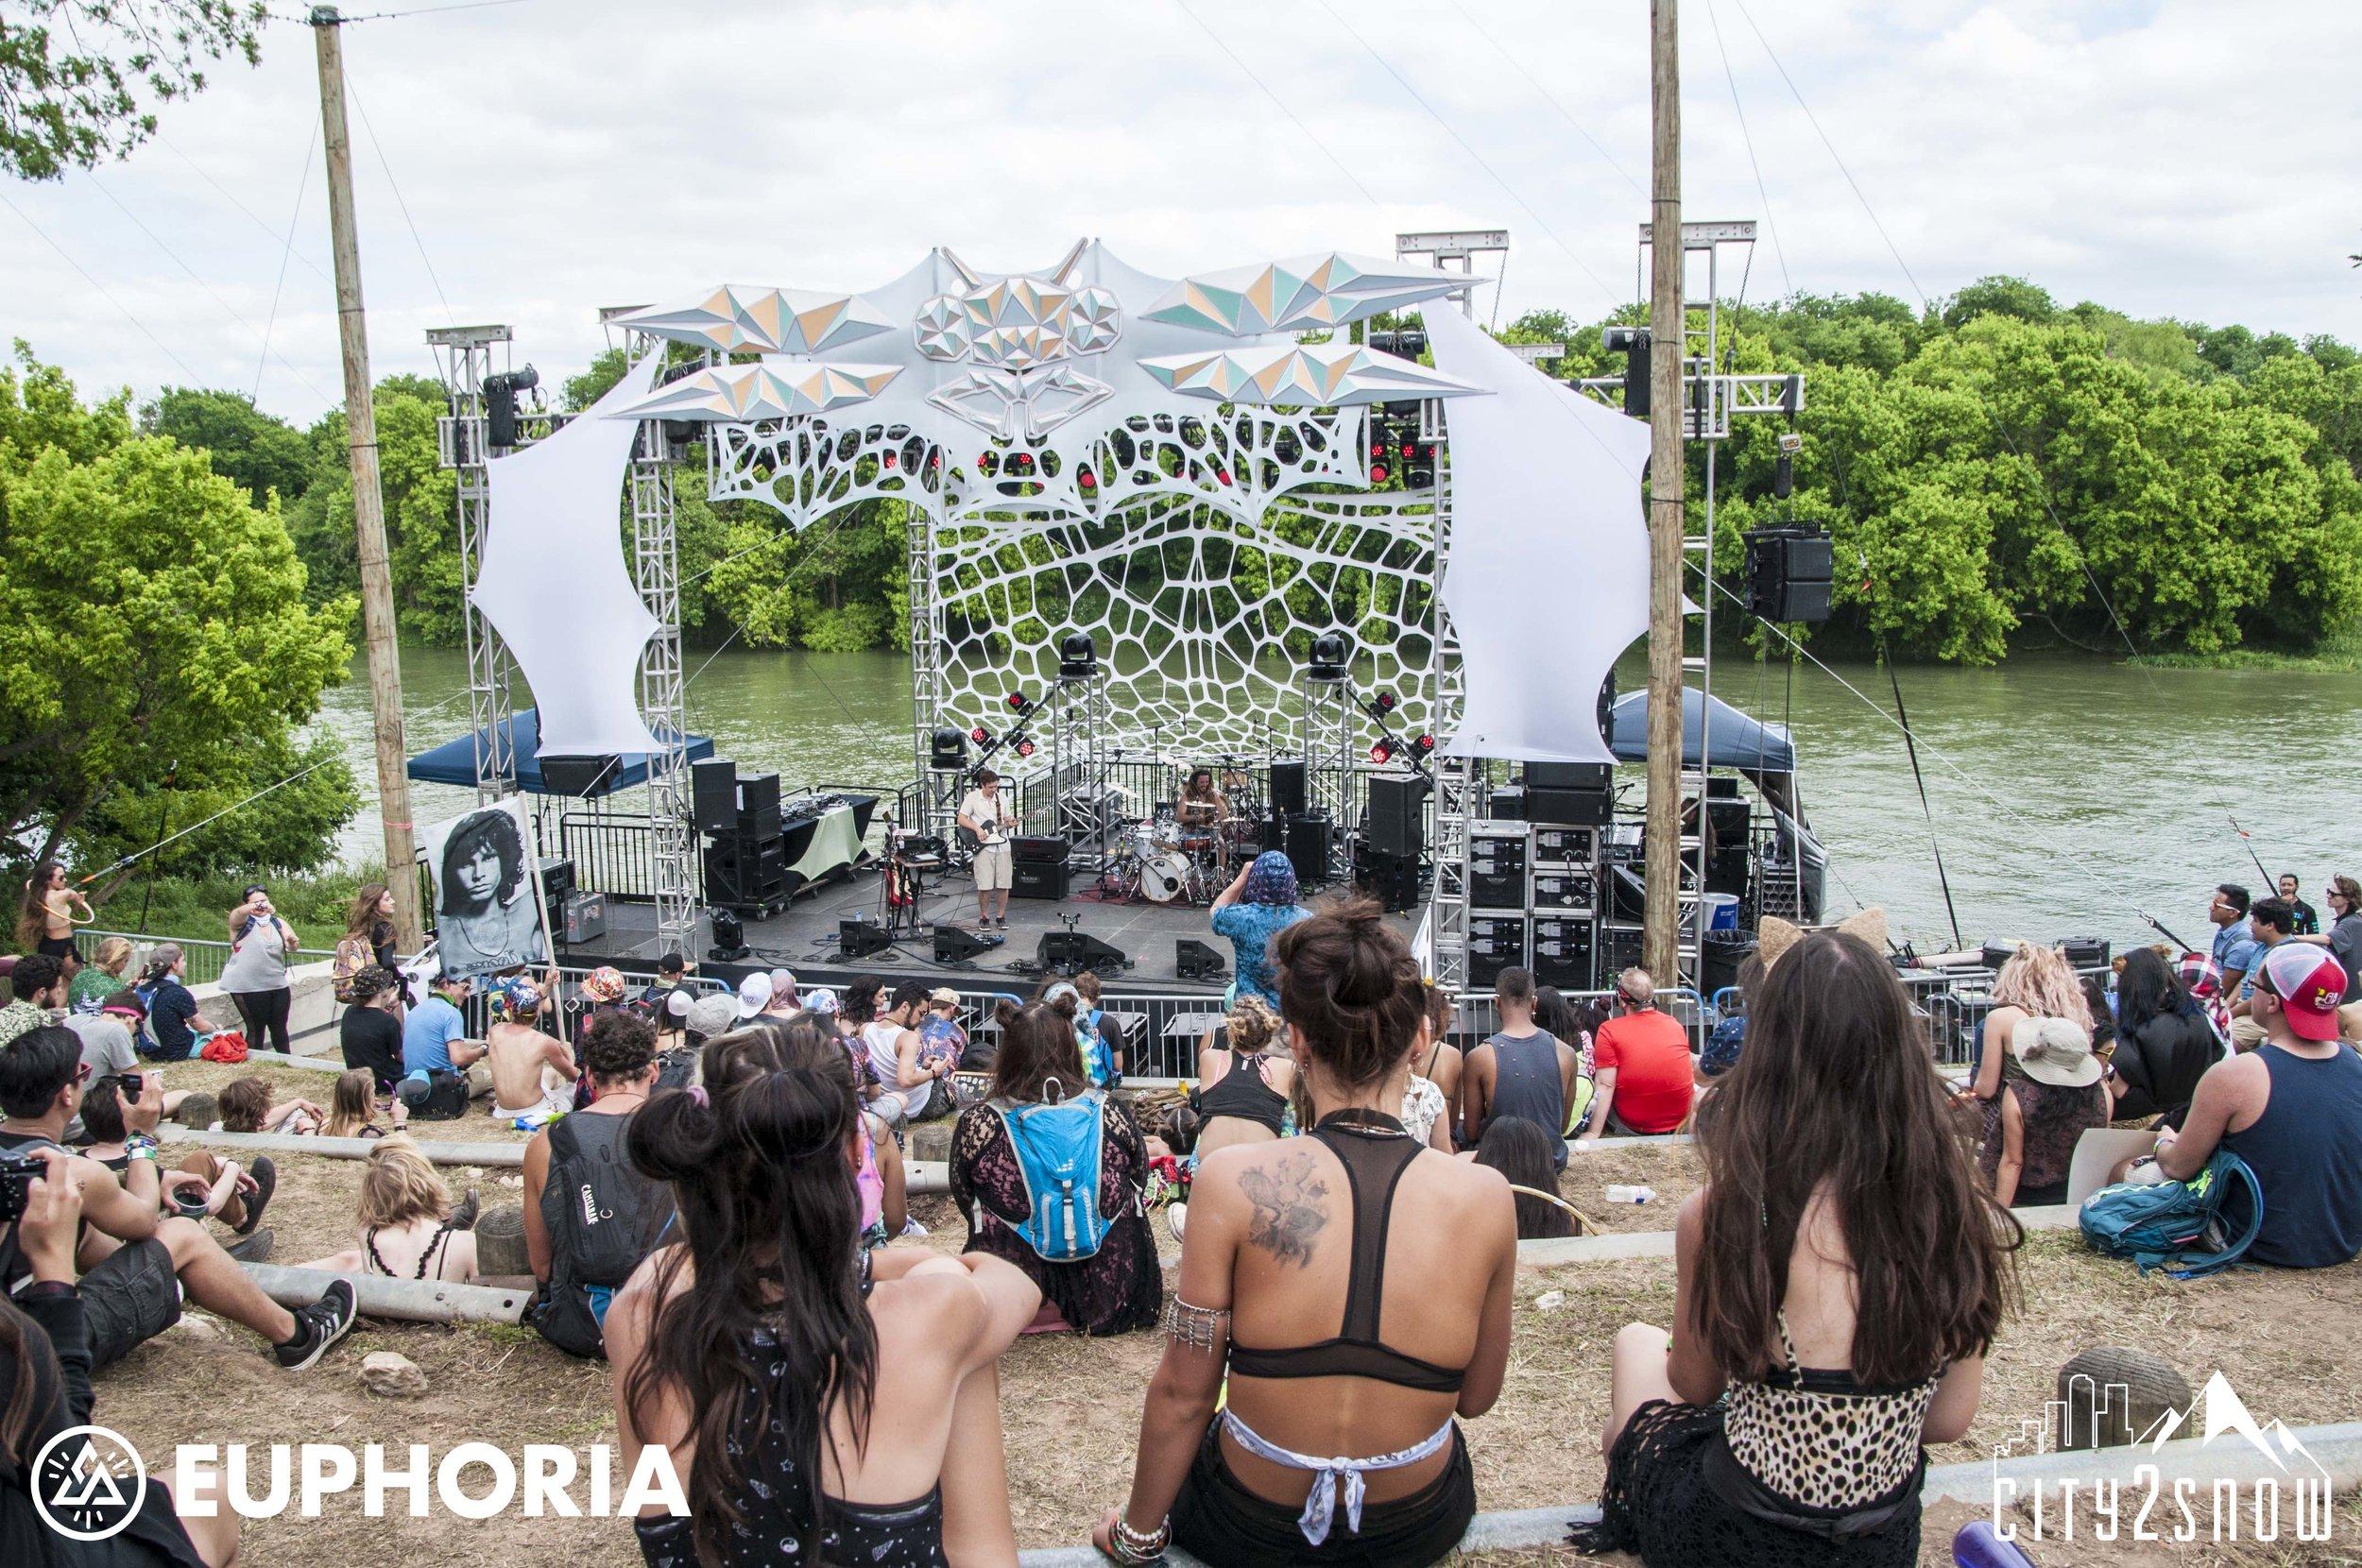 Euphoria-Music-Festival-2017-37.jpg